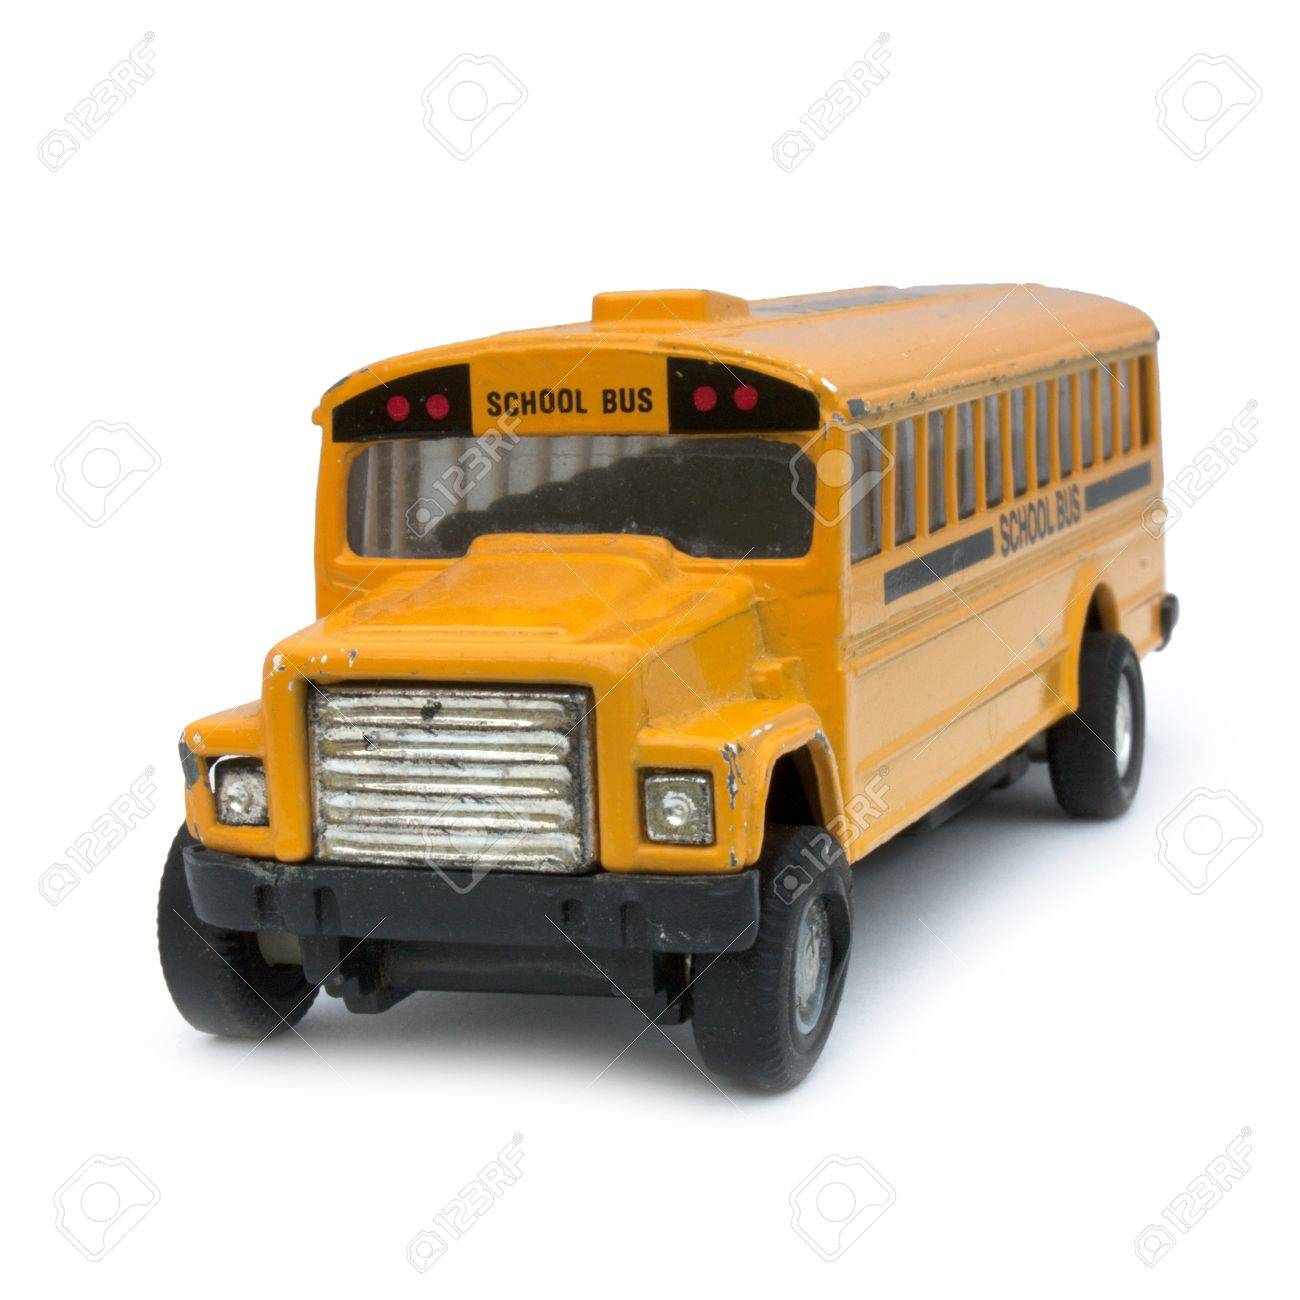 Yellow school bus toy (on a white background) Stock Photo - 12052873